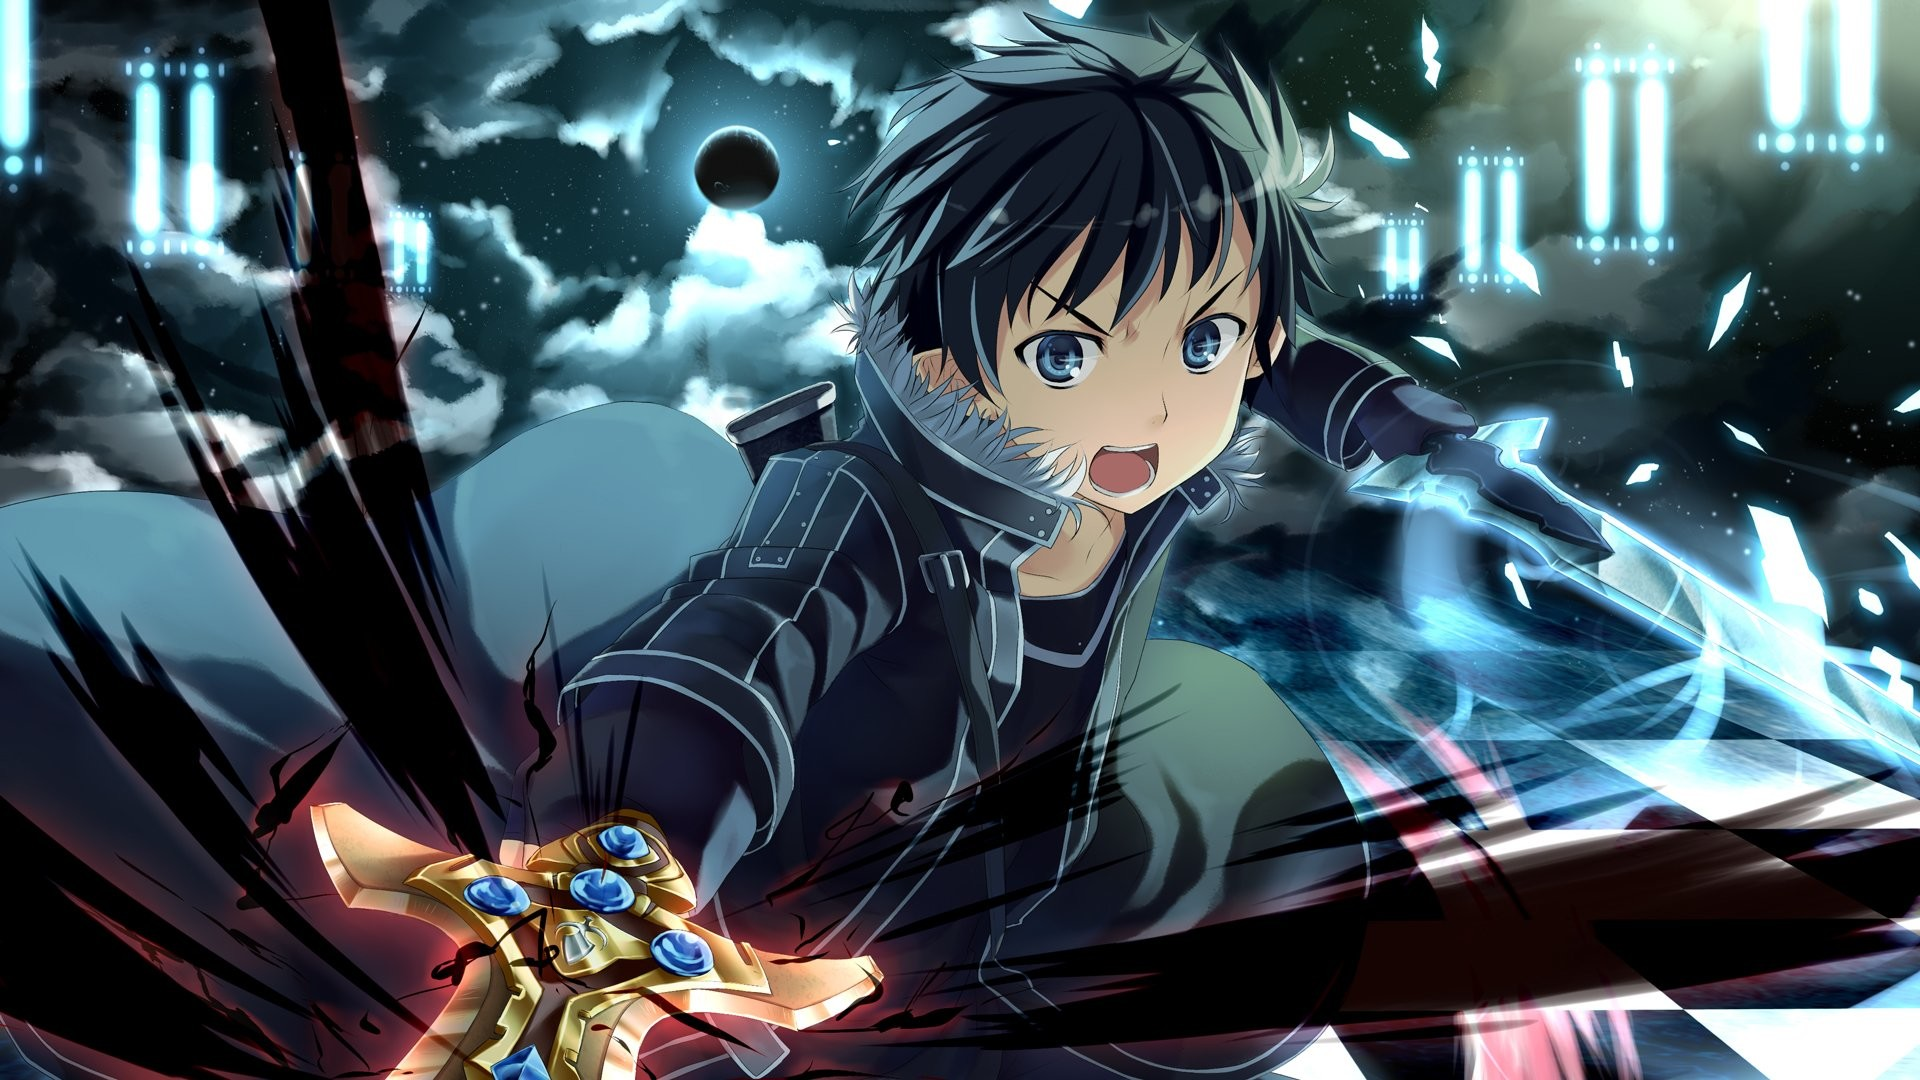 sword art online wallpaper 3d (69+ images)